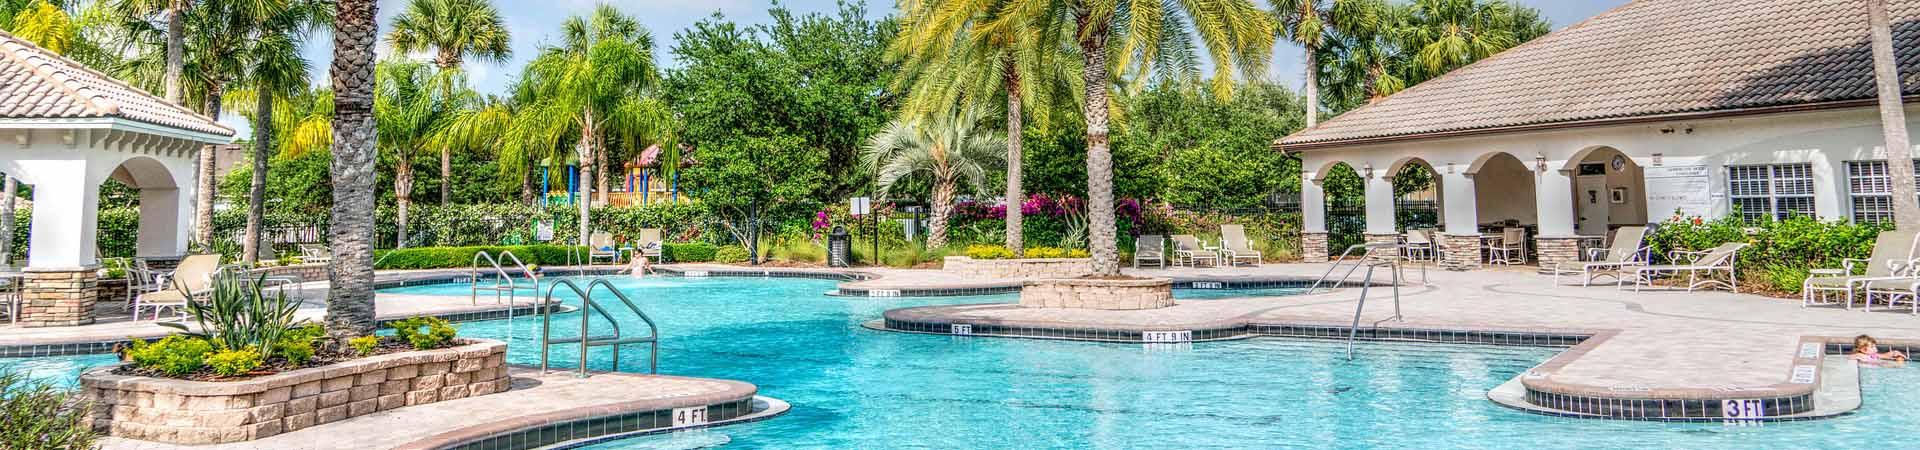 Stahlman Pool Company Pool Maintenance Amp Service In